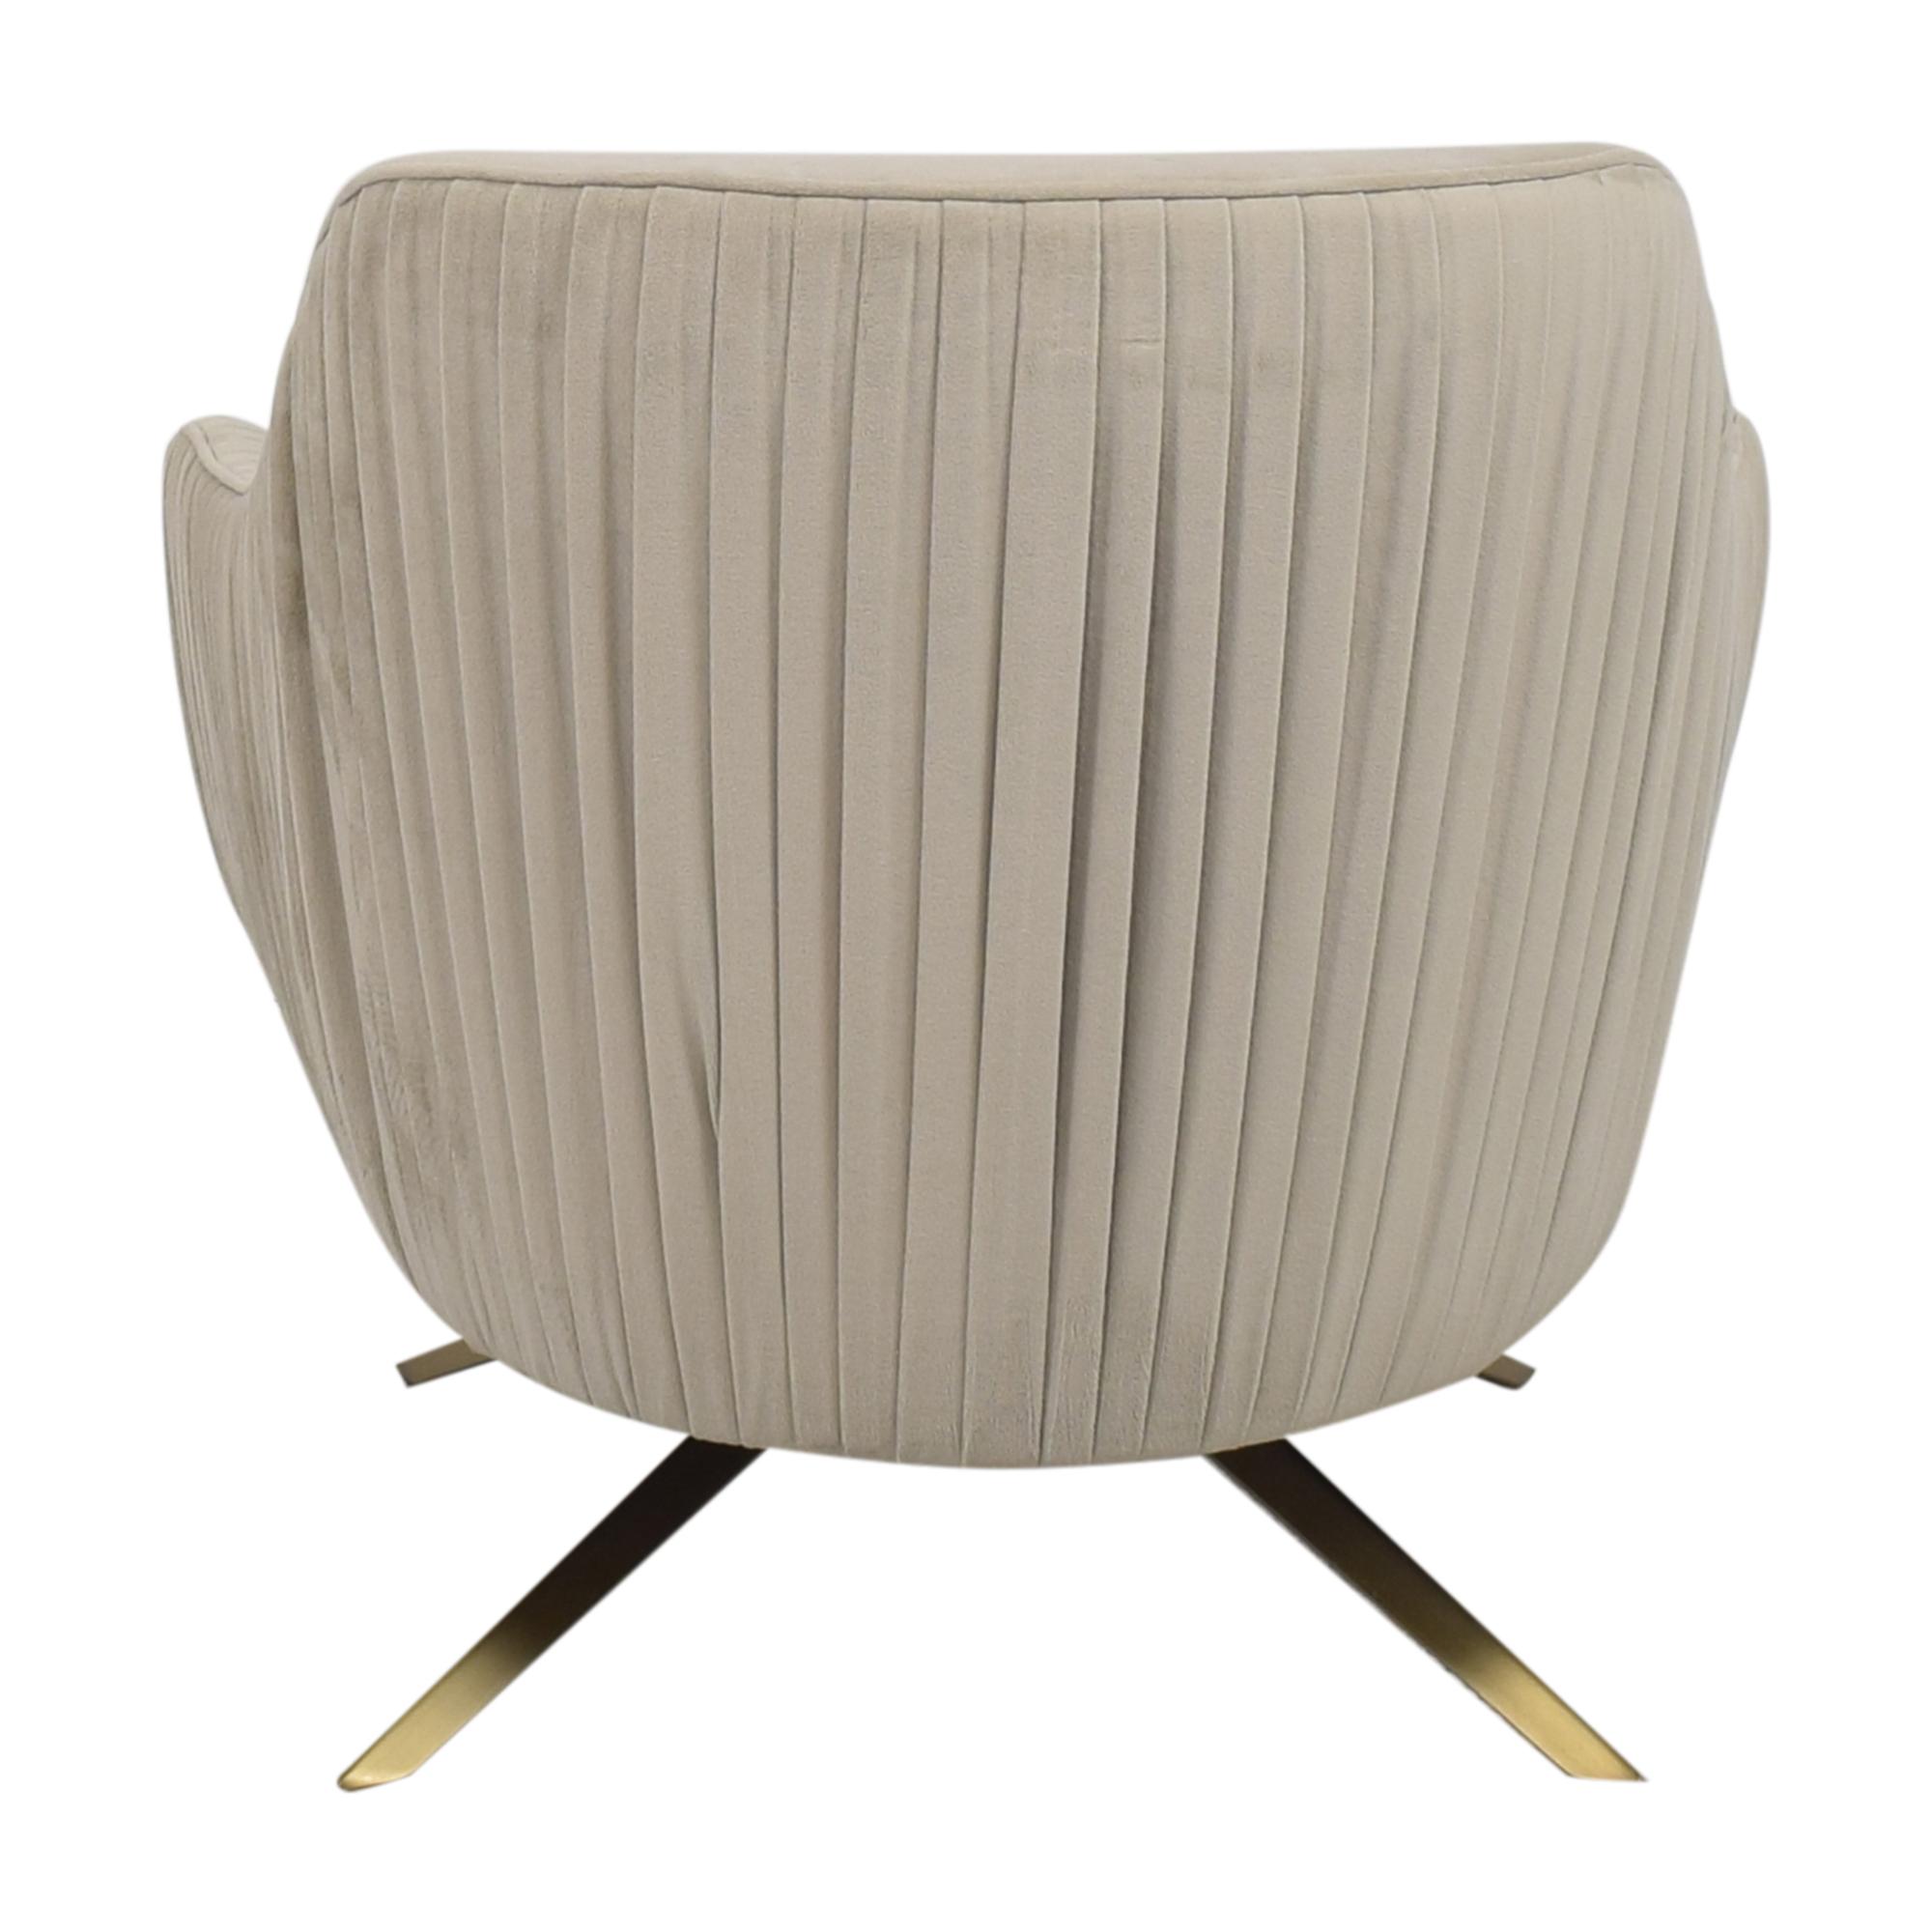 buy West Elm Roar & Rabbit Pleated Swivel Chair West Elm Chairs